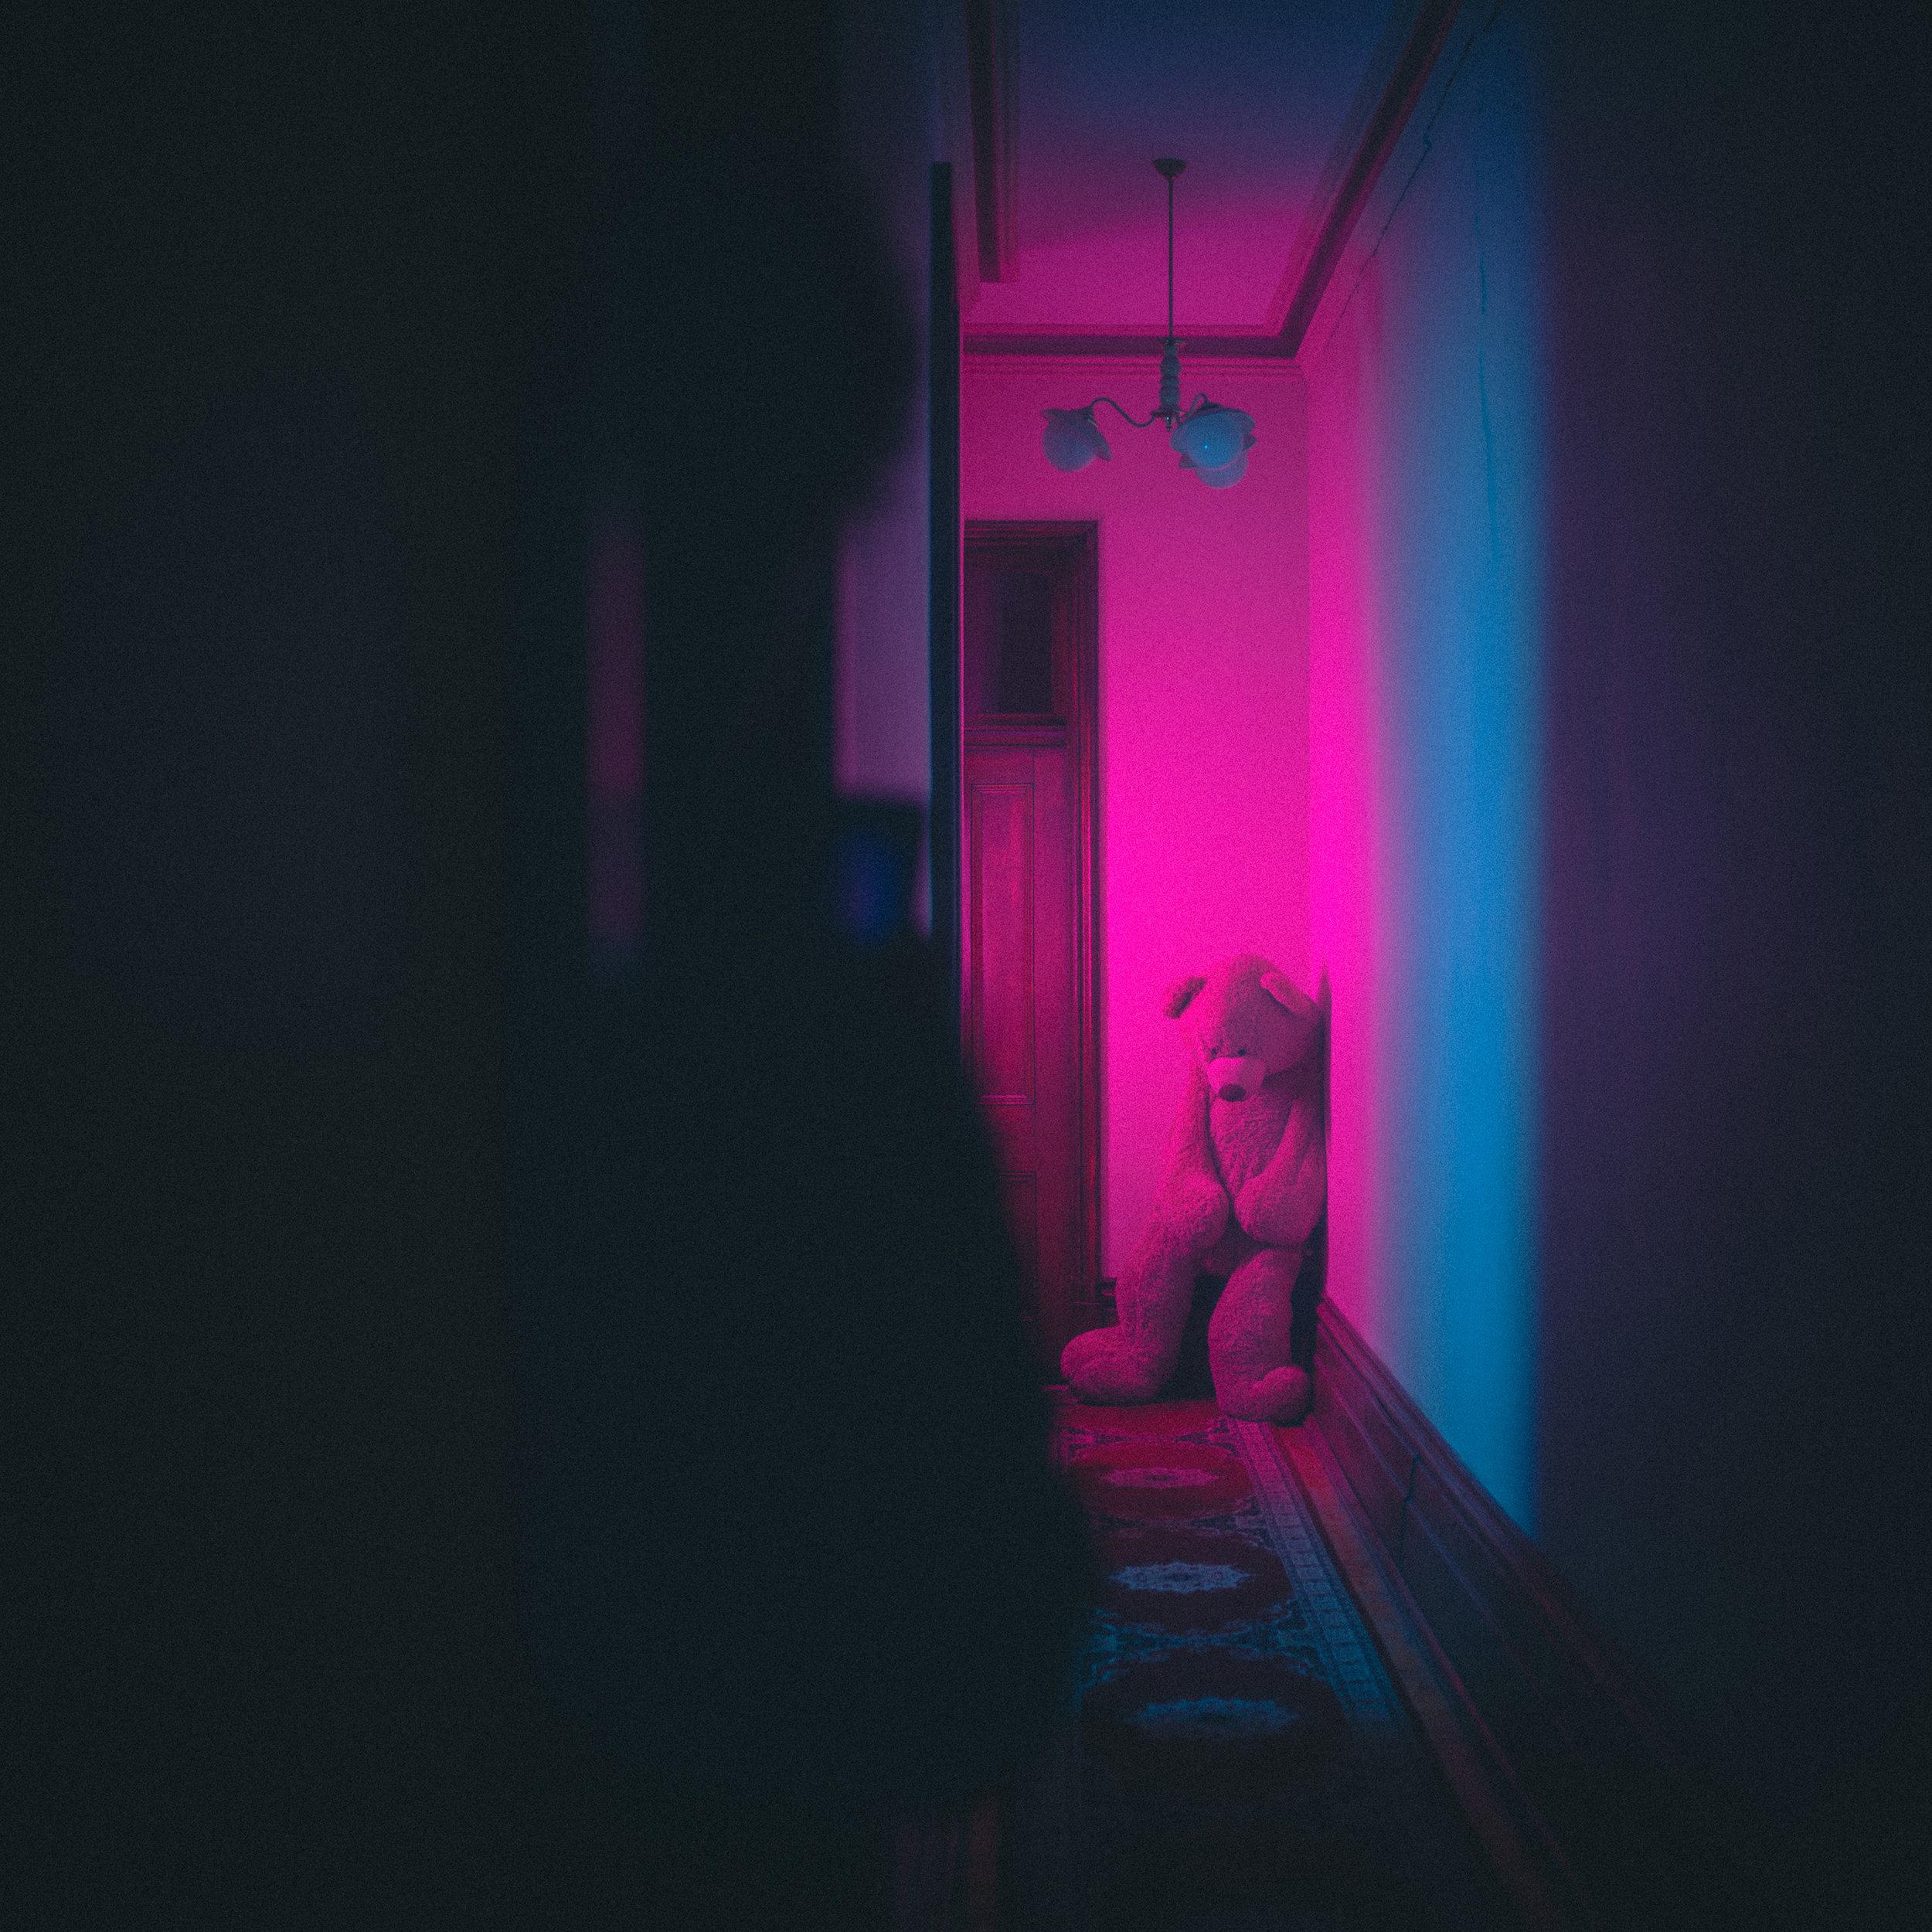 WVS034 - HVNCOQ - Mama's House feat. Oscar Key Sung - Artwork.jpg